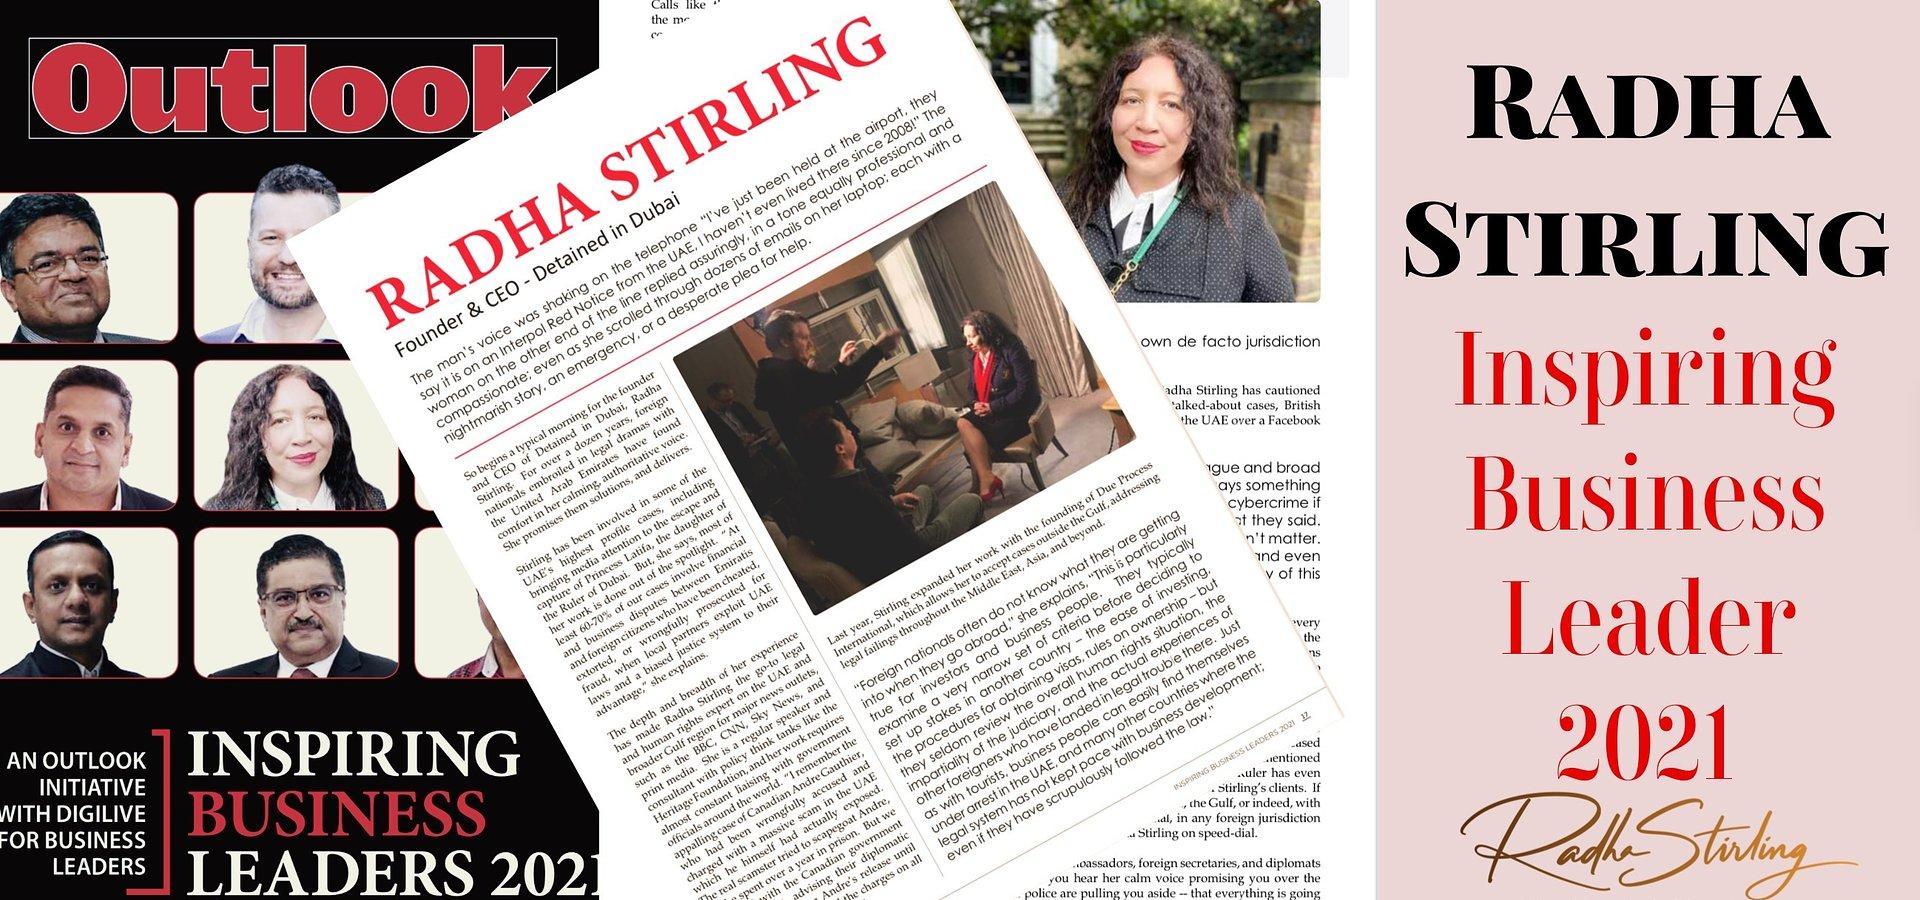 Radha Stirling - Inspiring Leader 2021 Magazine Feature